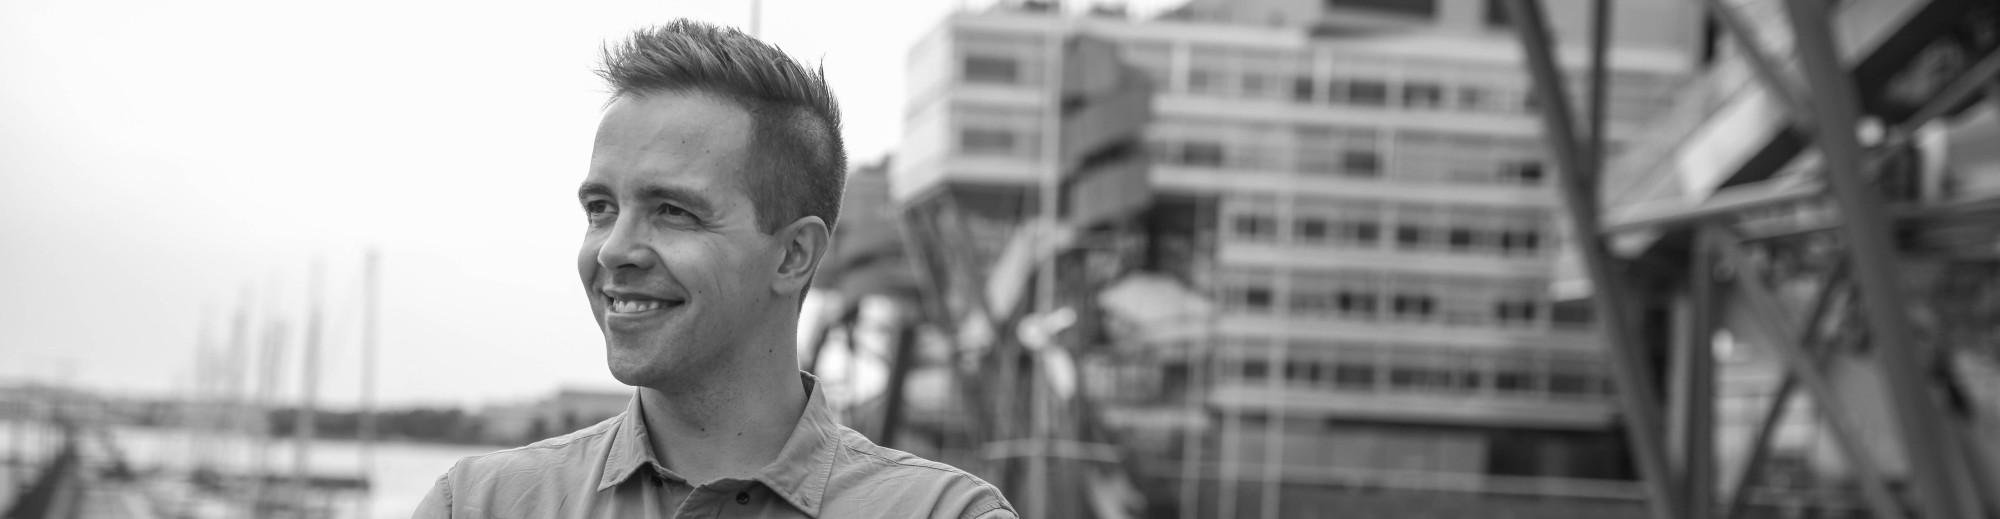 Ilkka Kurkela – Exploring Life